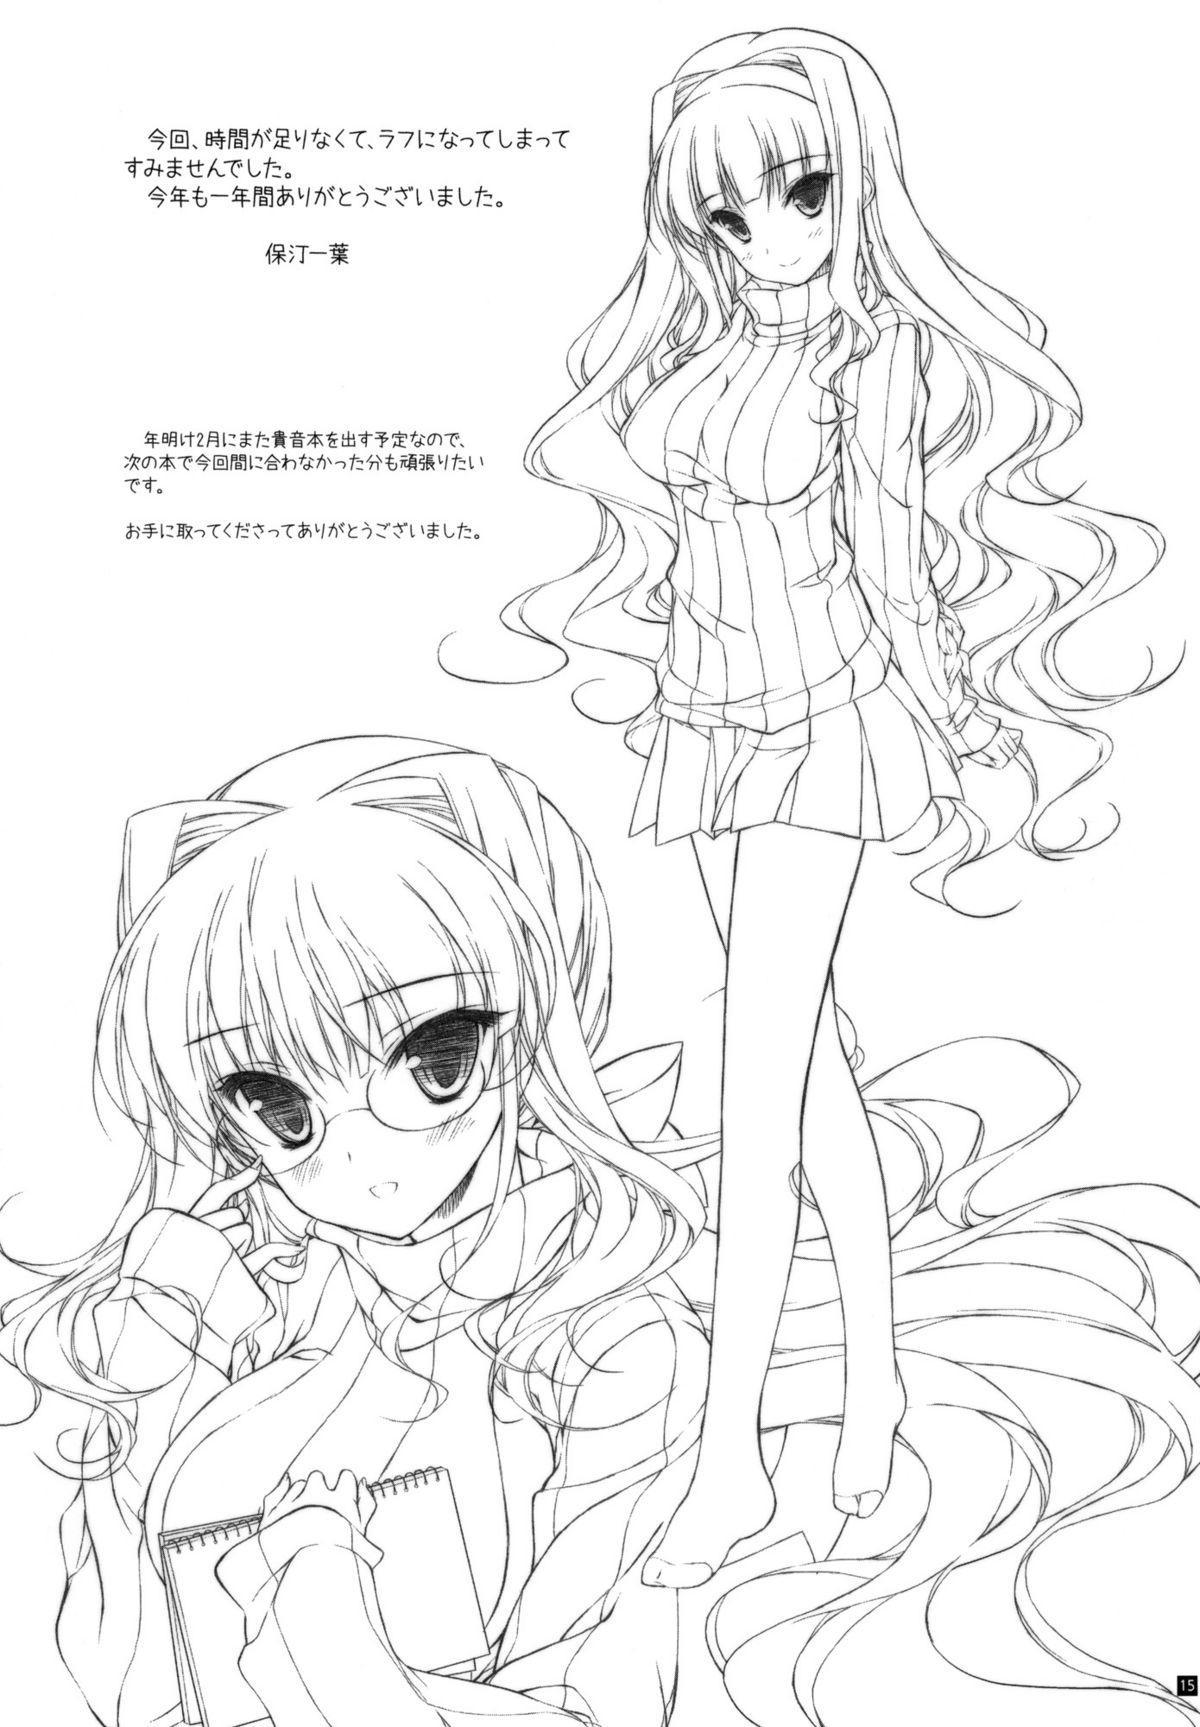 Hatsujou Princess 3 13